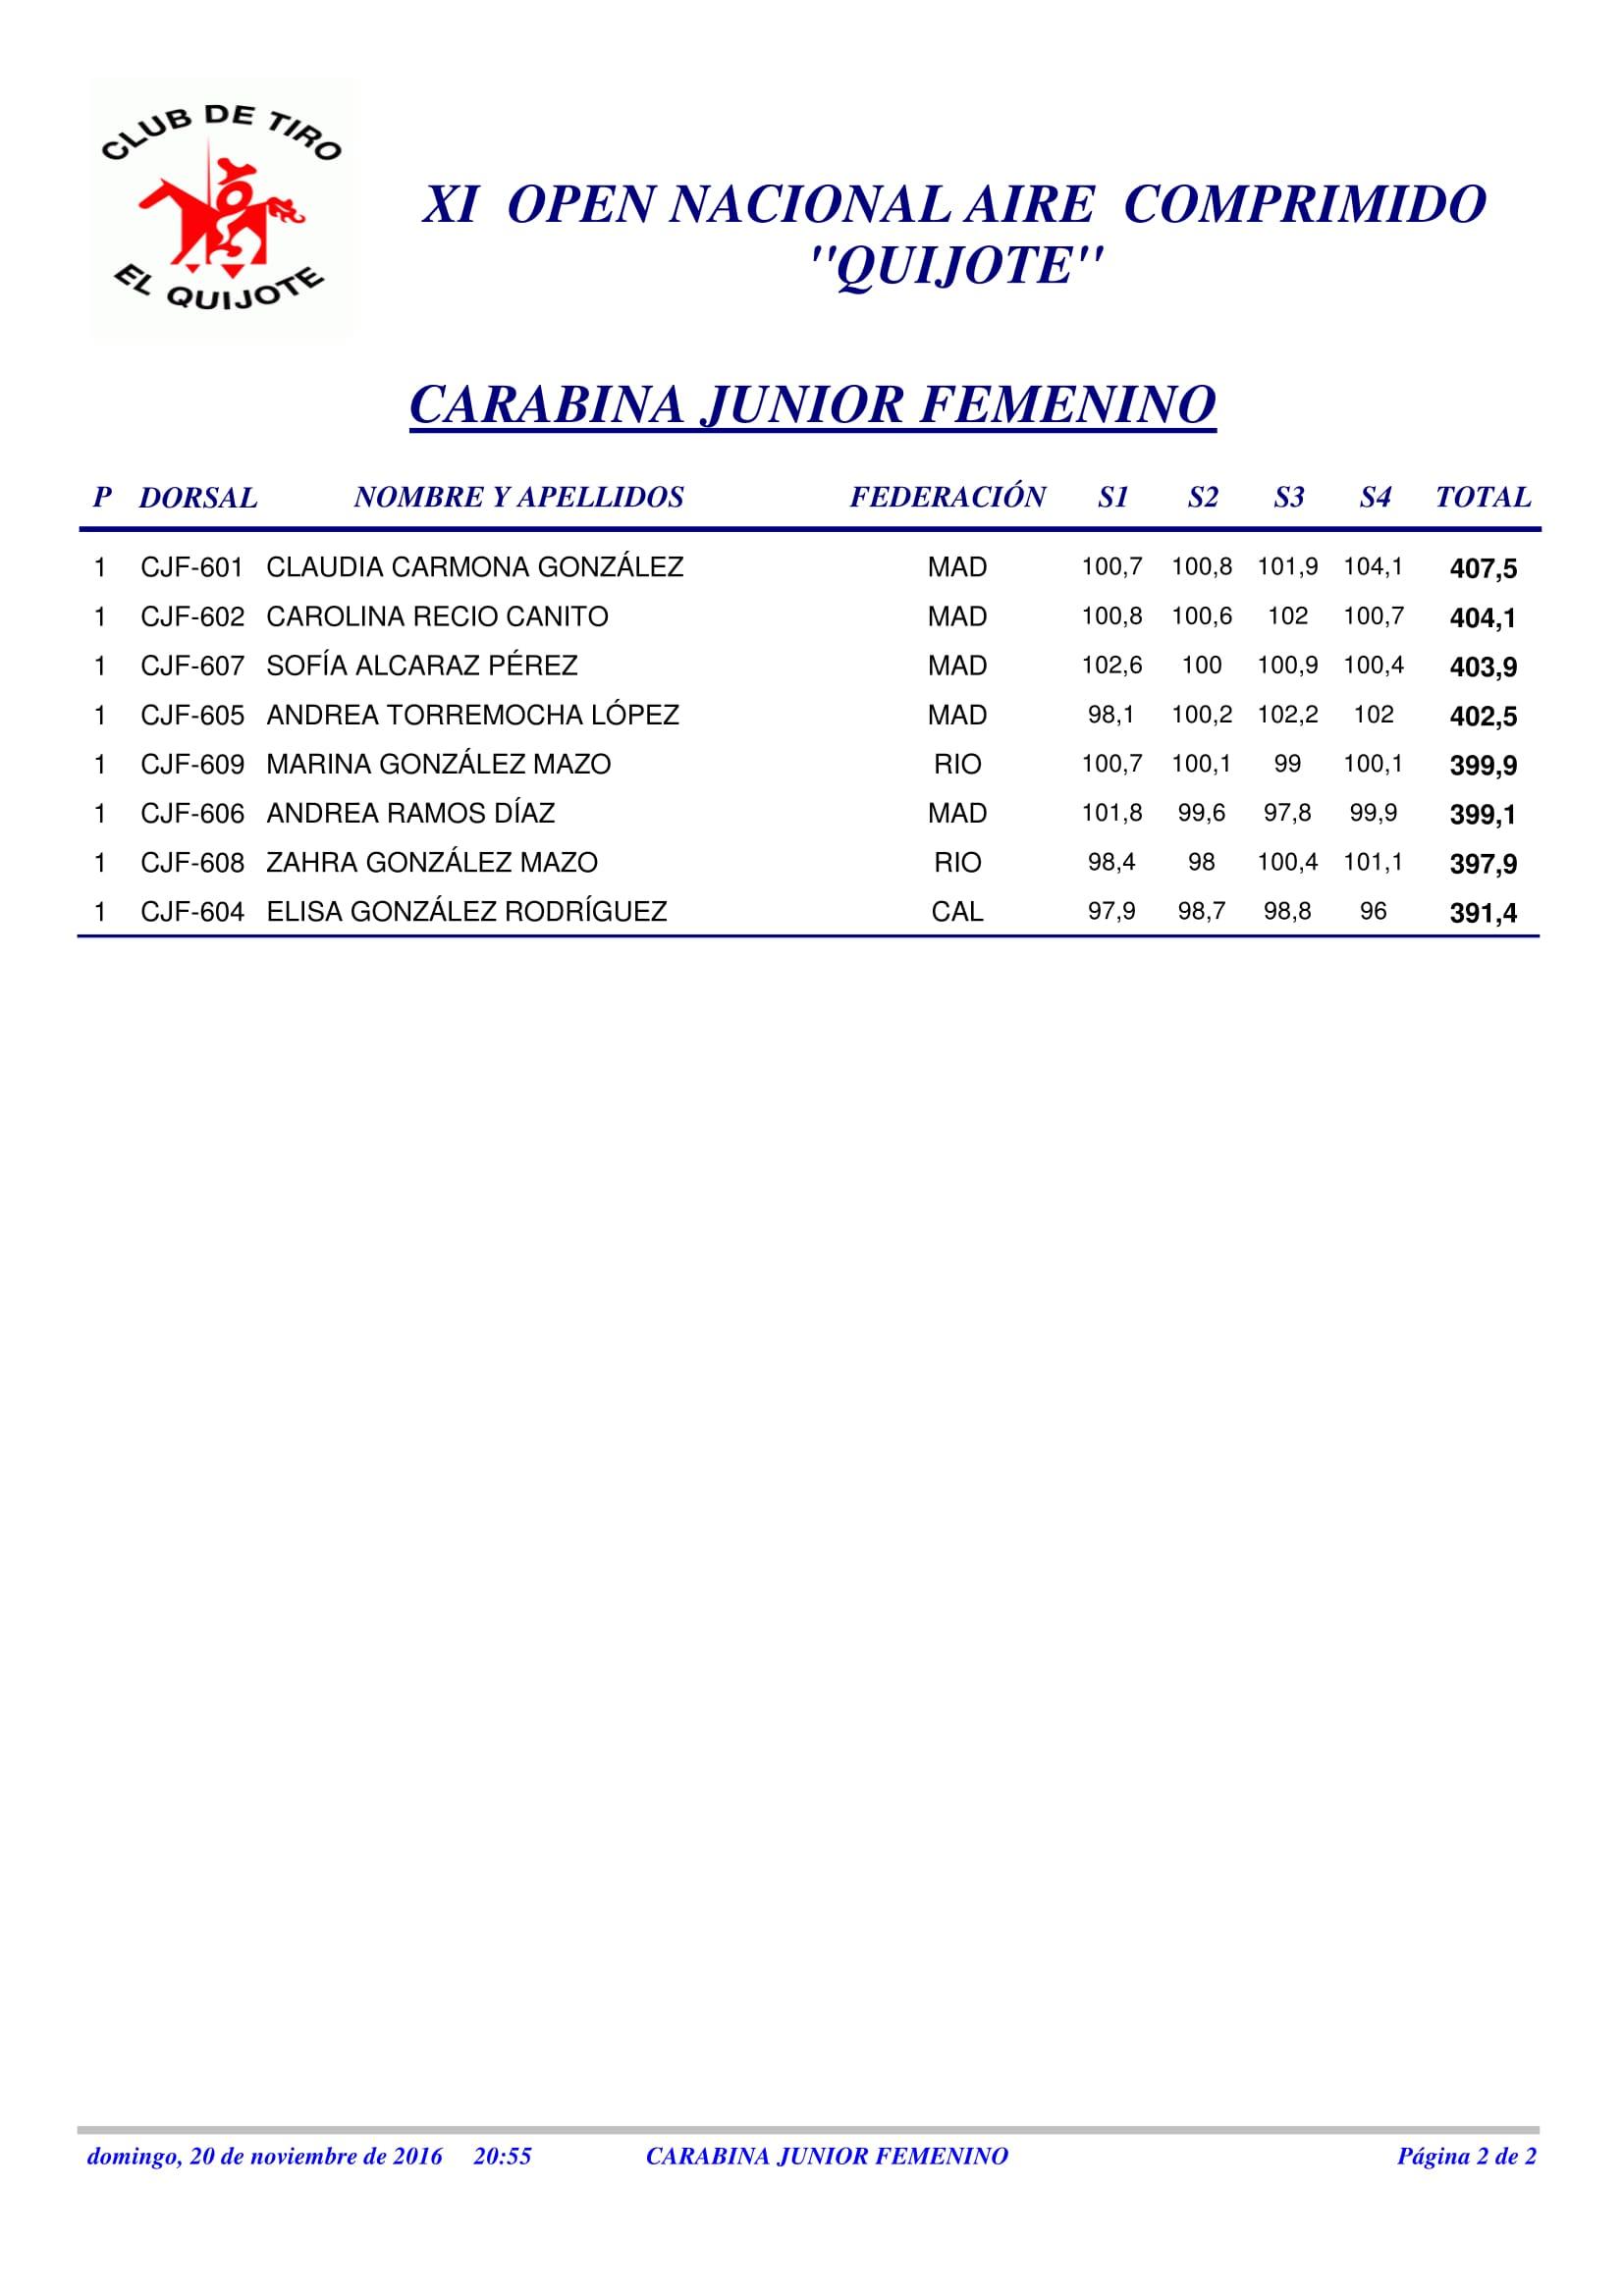 carabina-juniors-femeninos-1